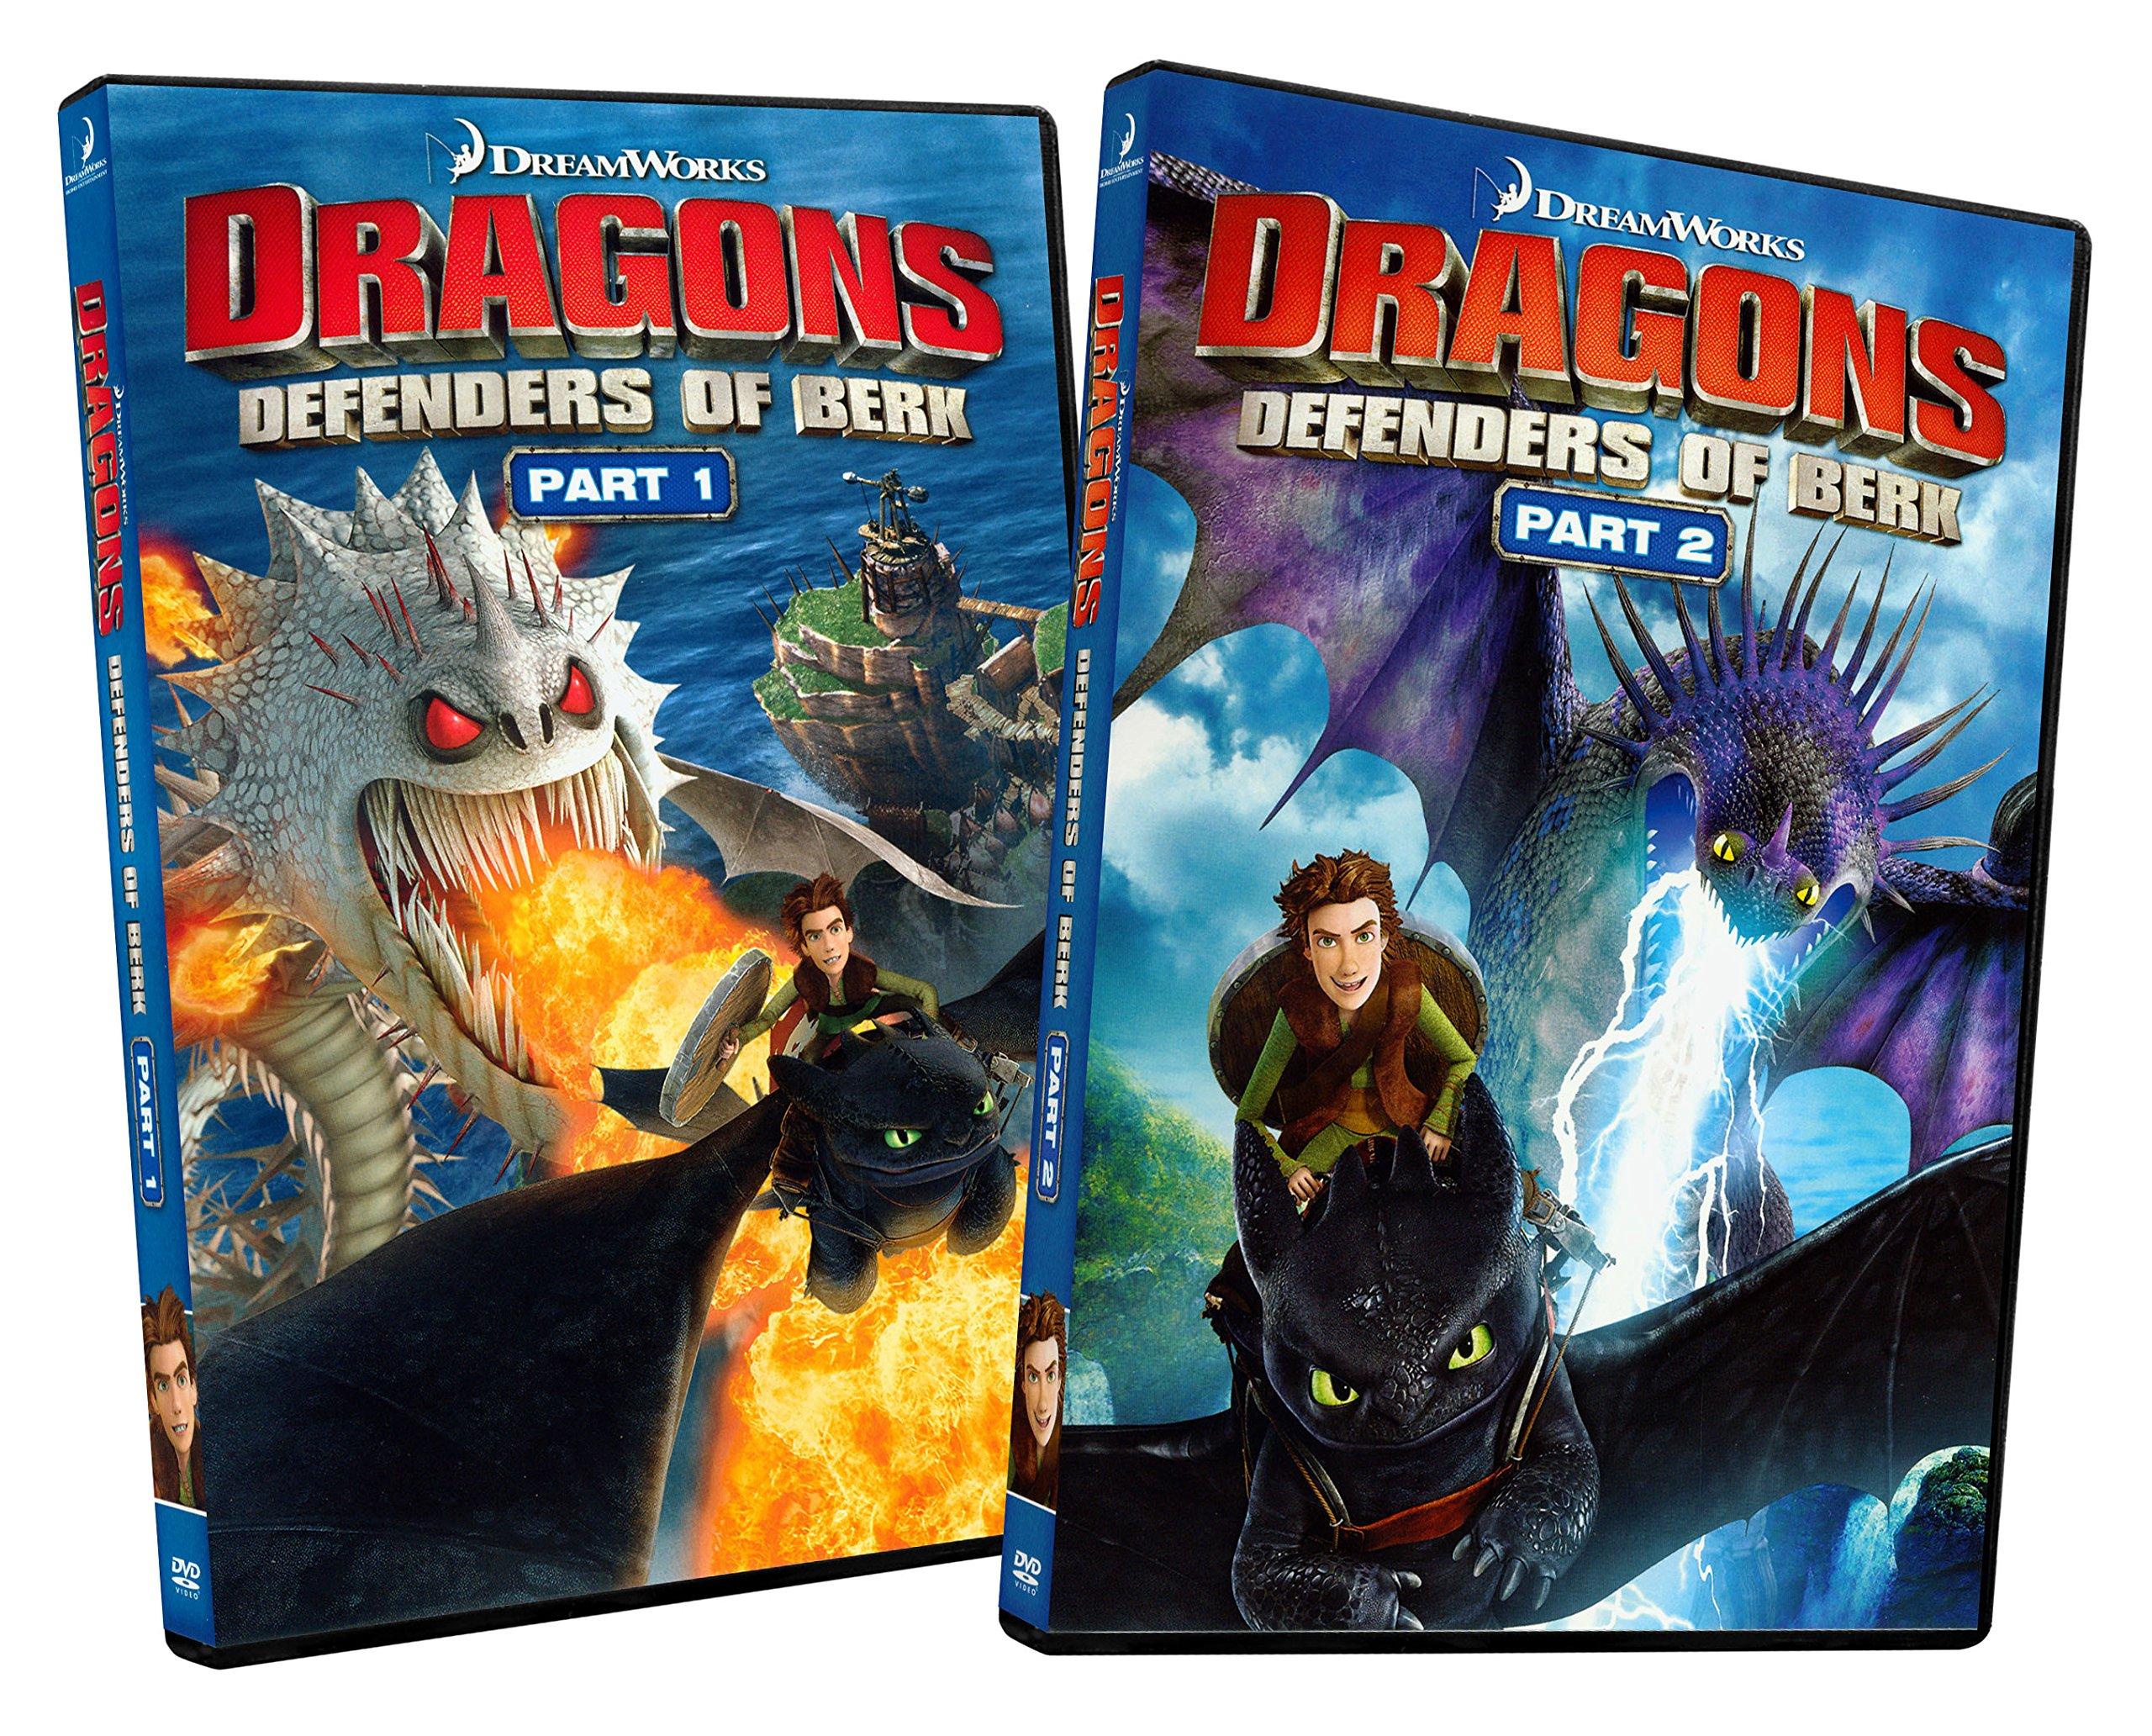 Dragons: Defenders of Berk (Part 1 / Part 2)